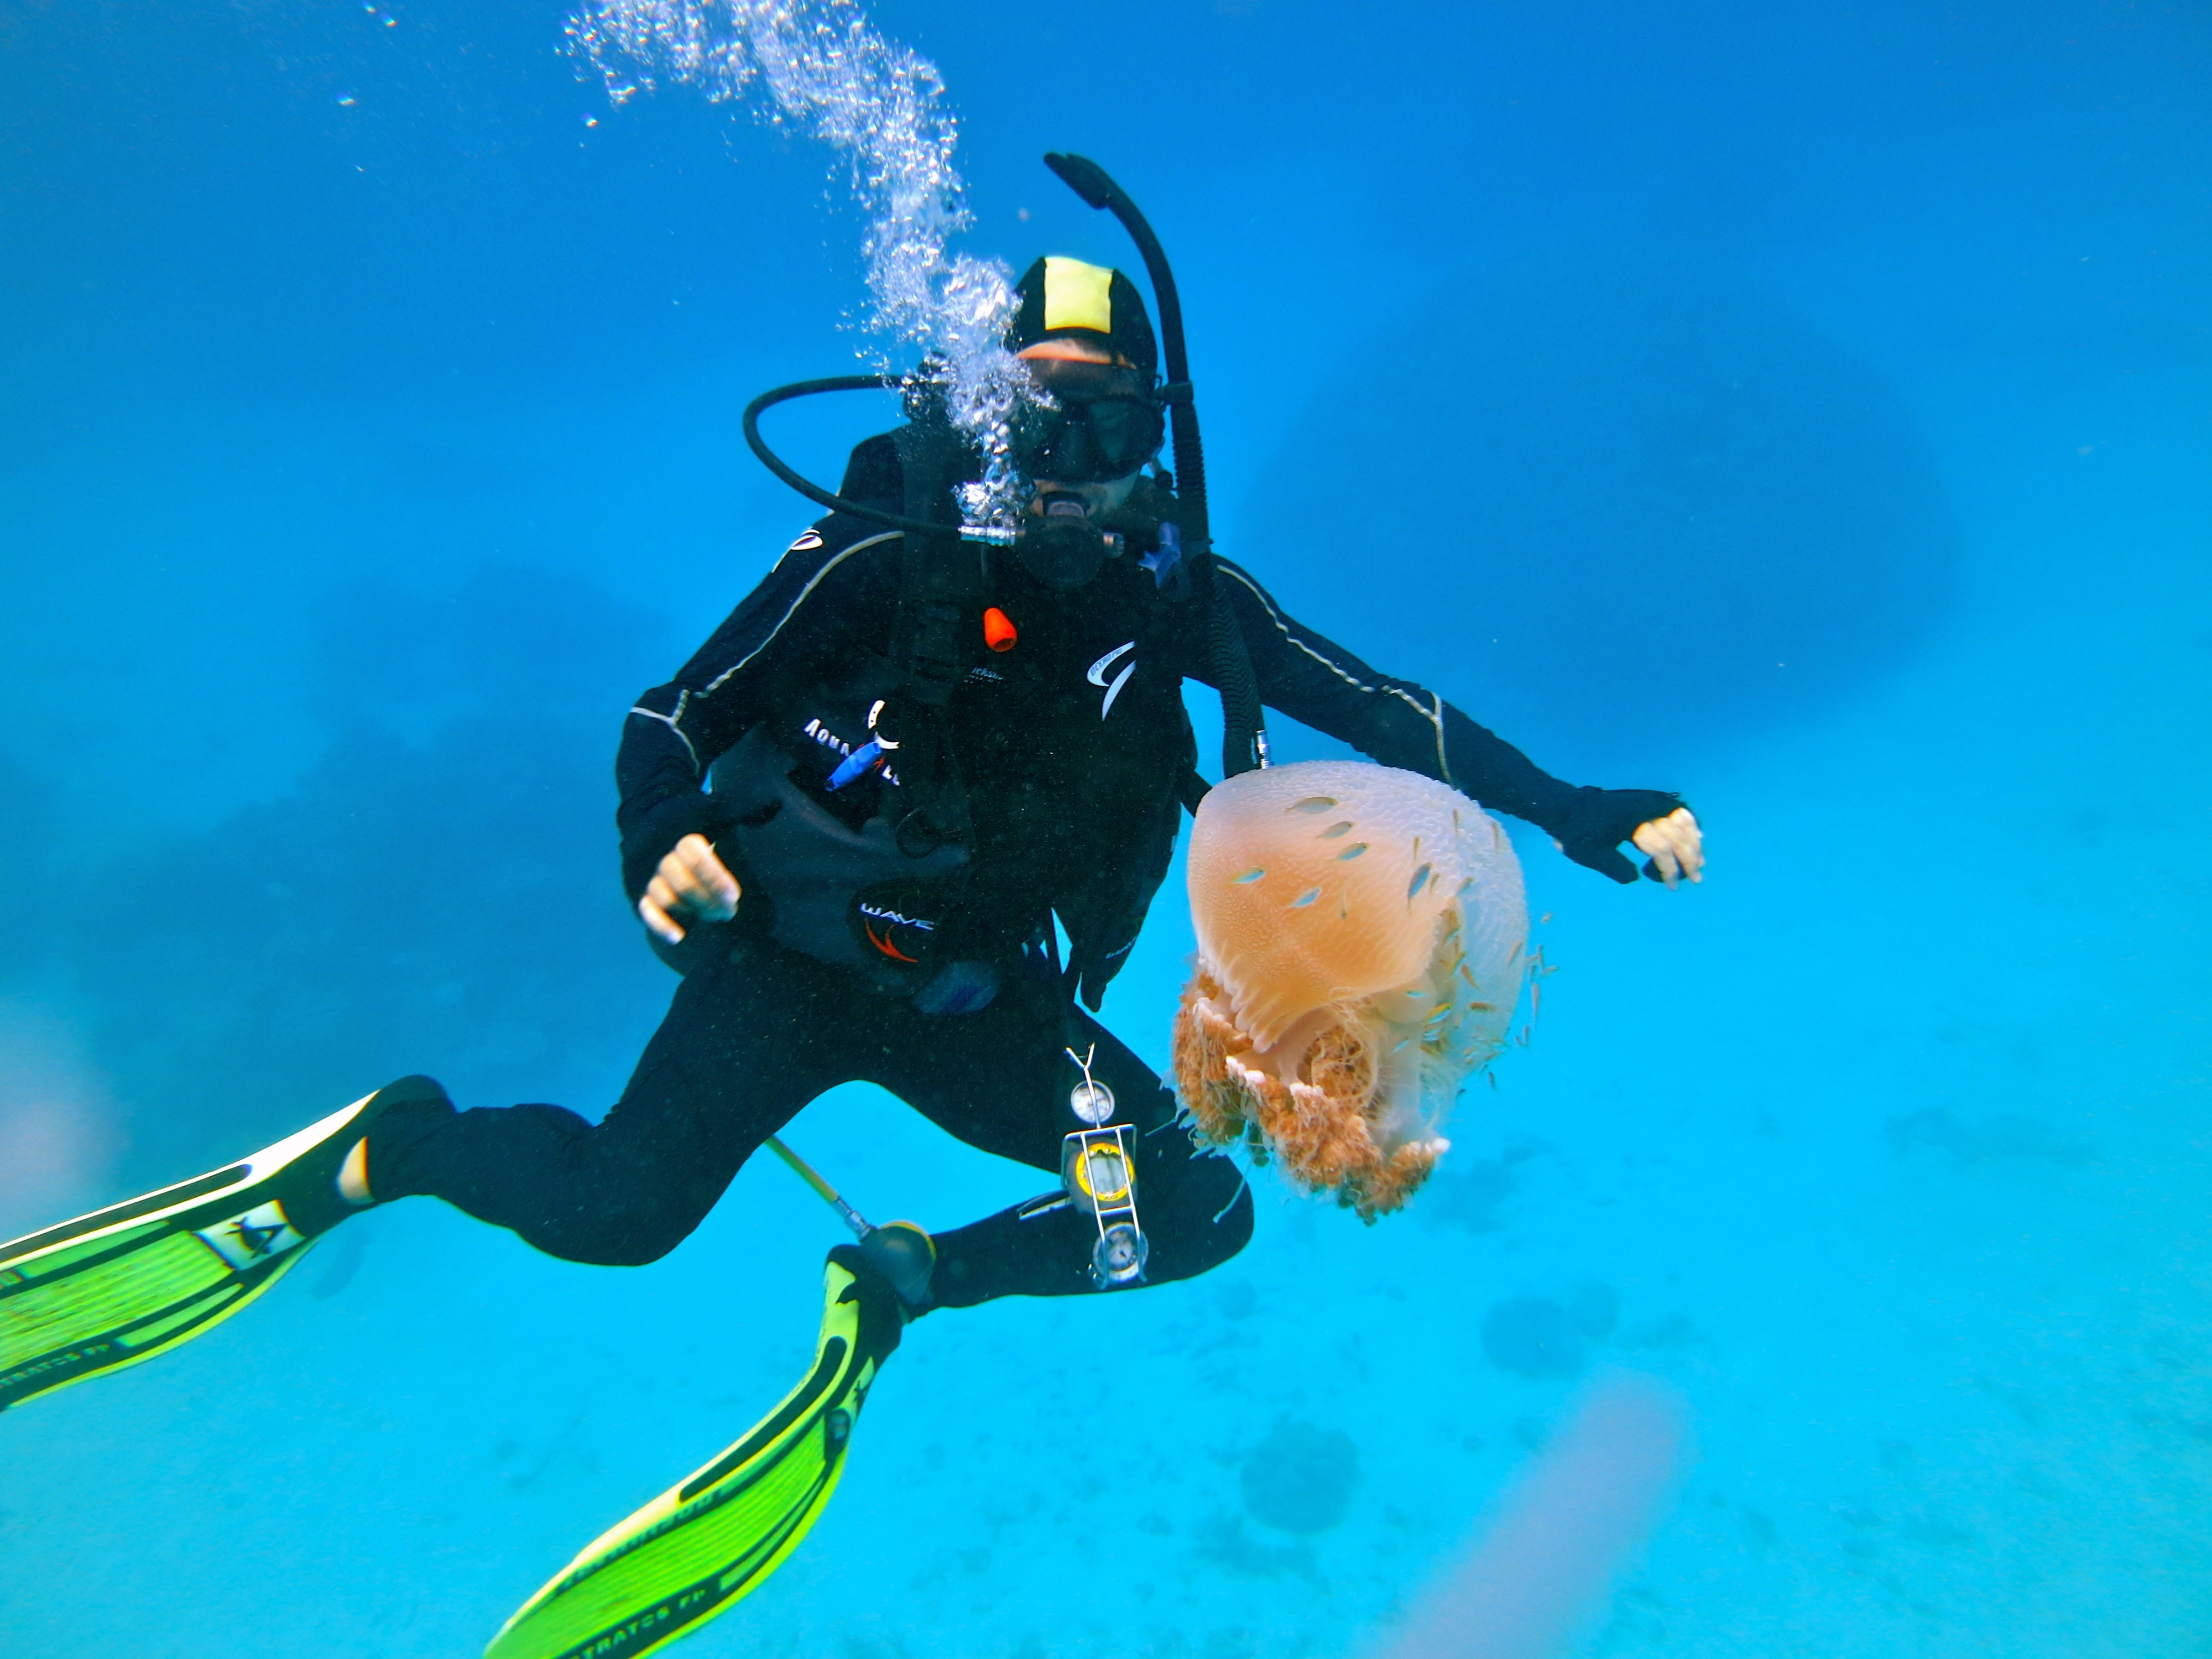 scuba diving wallpaper wallpapers - photo #37